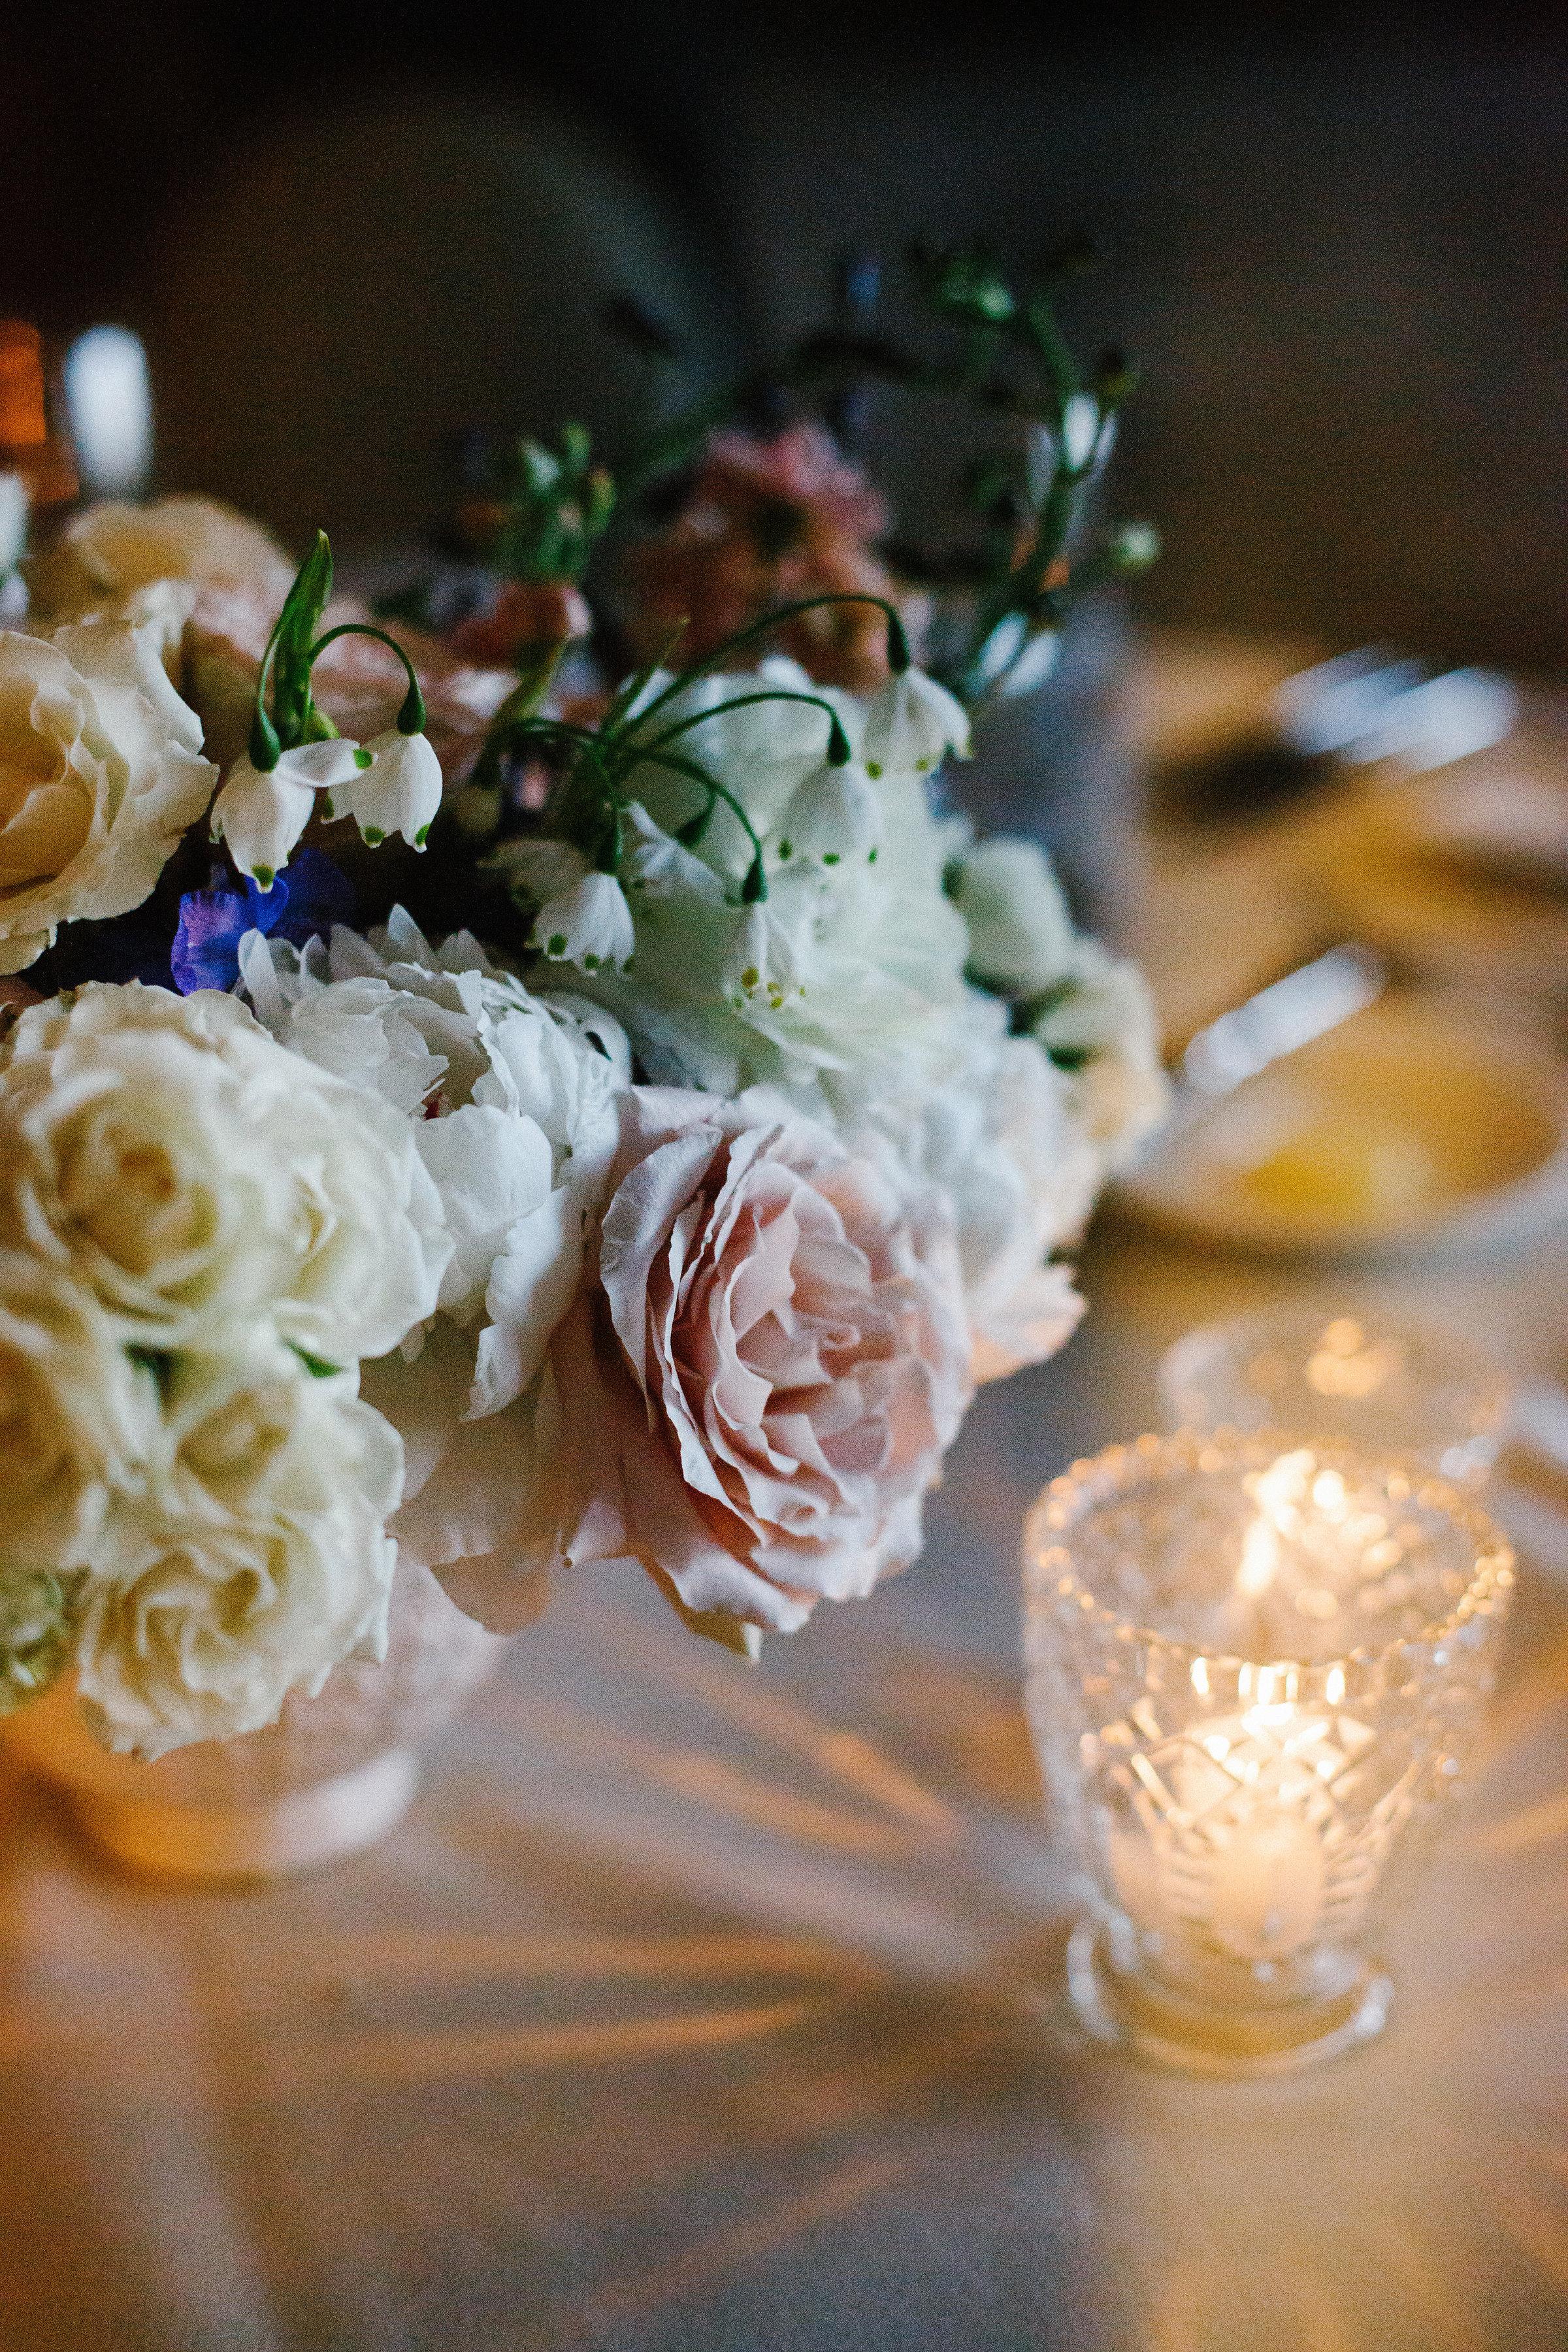 Fleur-Inc-Wedding-Chicago-Athletic-Association-Kina-Wicks-Photography-LIven-It-Up-White-City-Ballroom-Spring-Centerpiece-Spring-Wedding